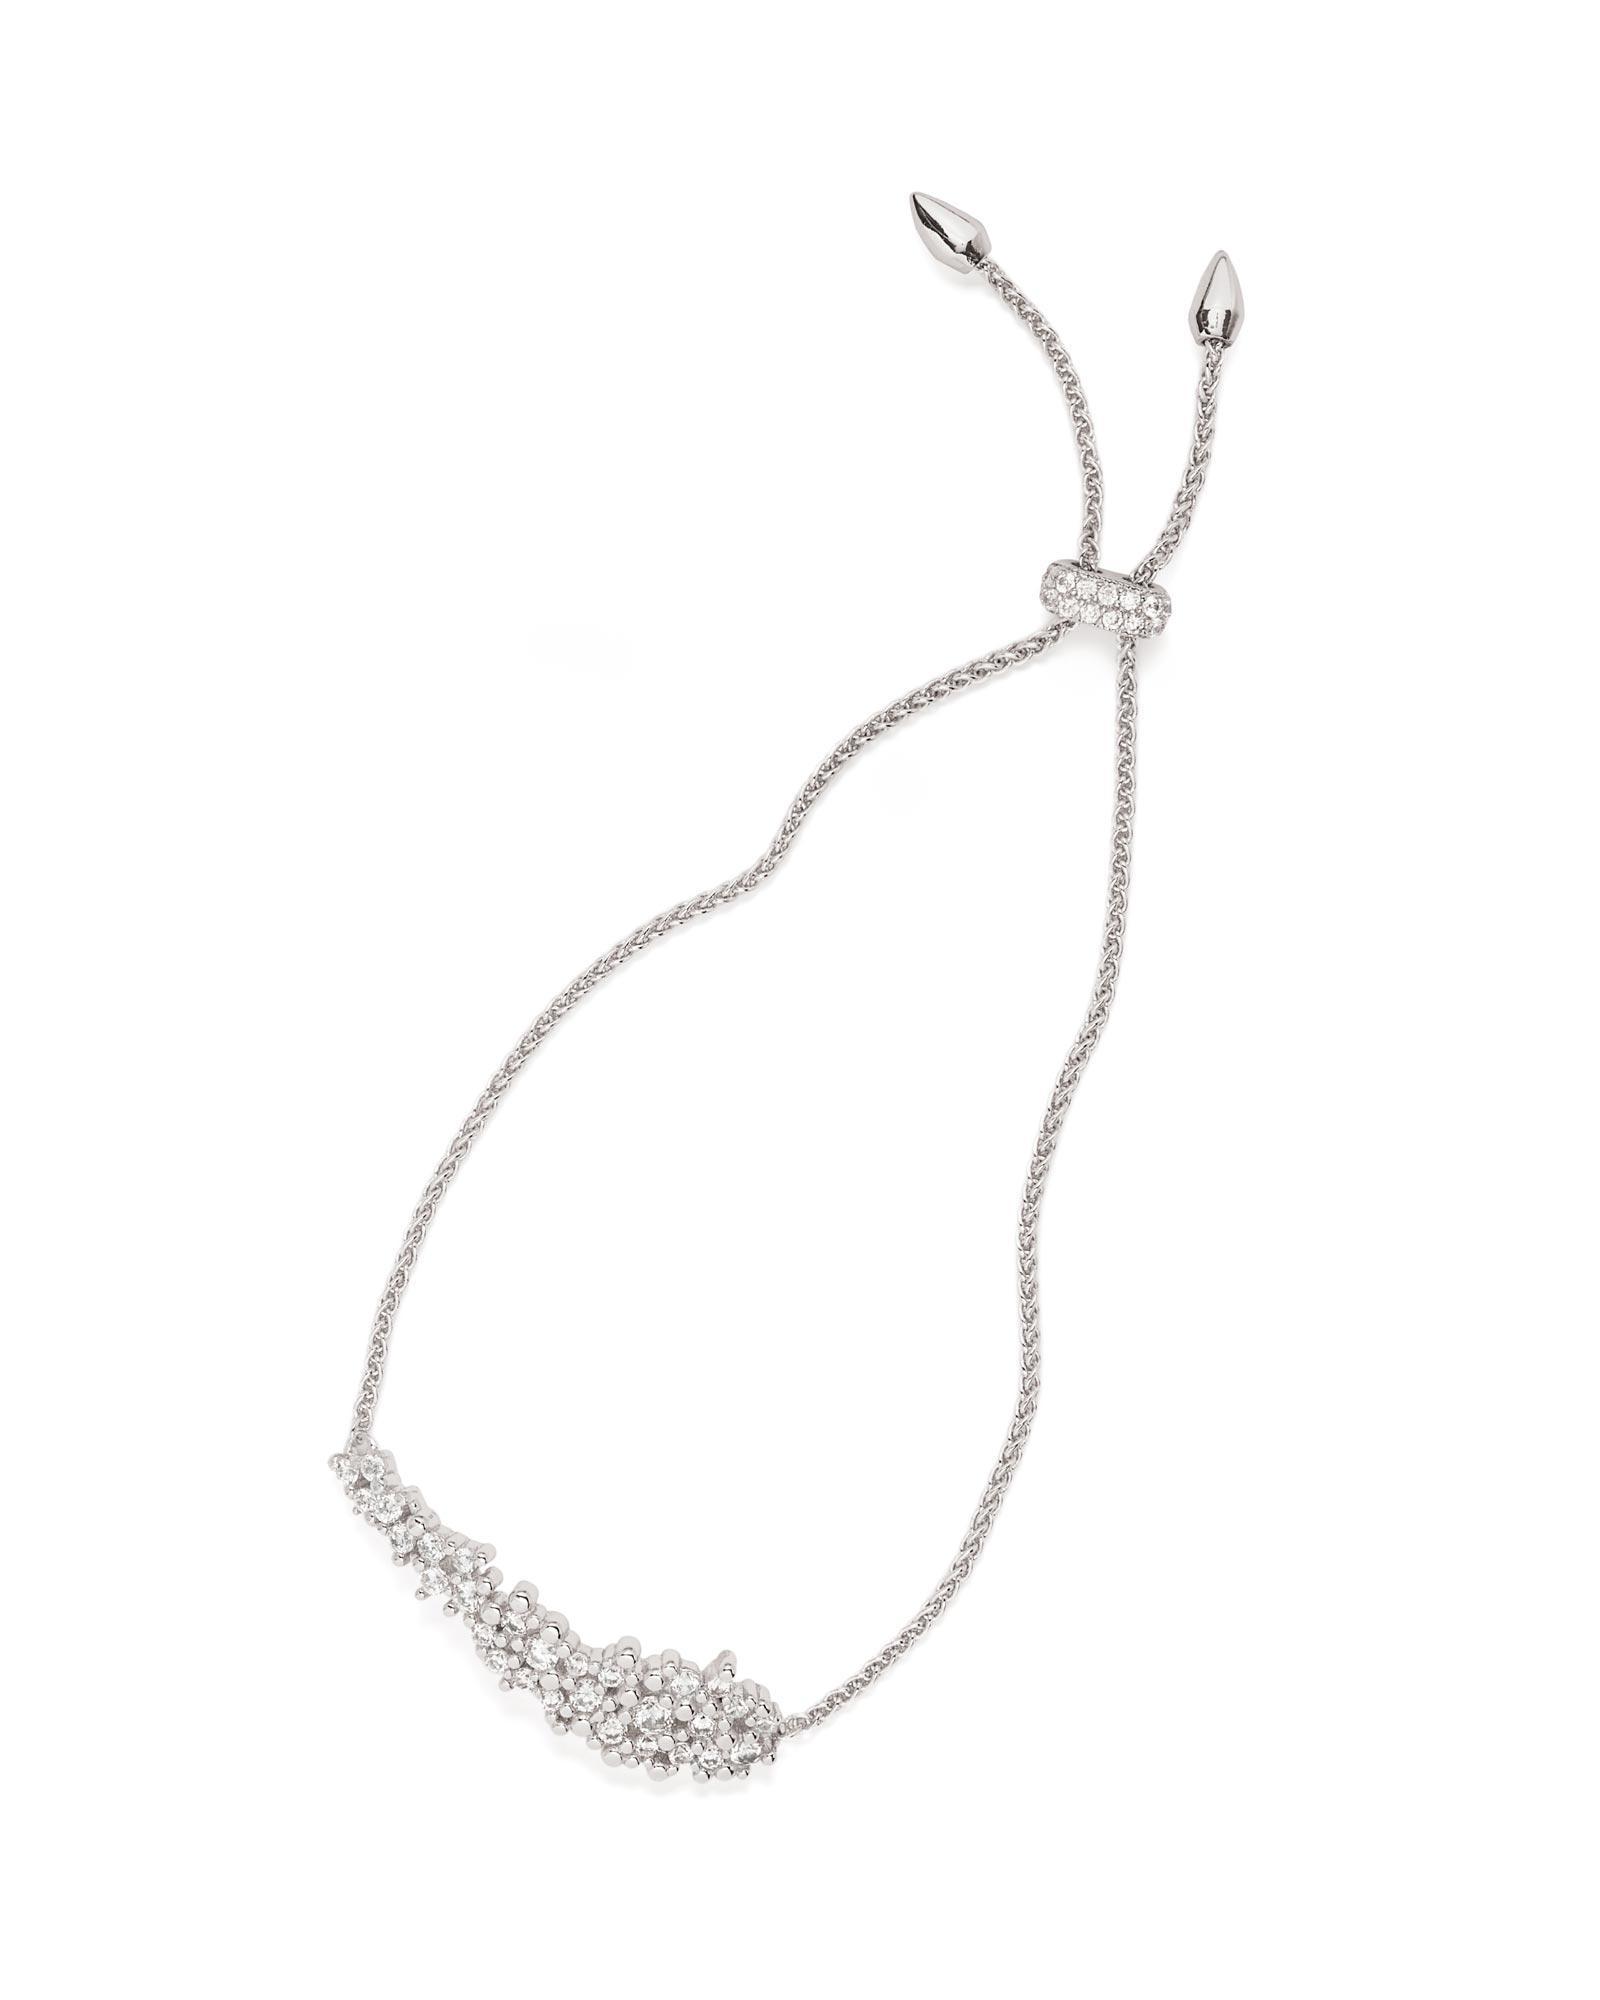 5a2c26ebe98d8a Lyst - Kendra Scott Nolan Adjustable Chain Bracelet in Metallic ...